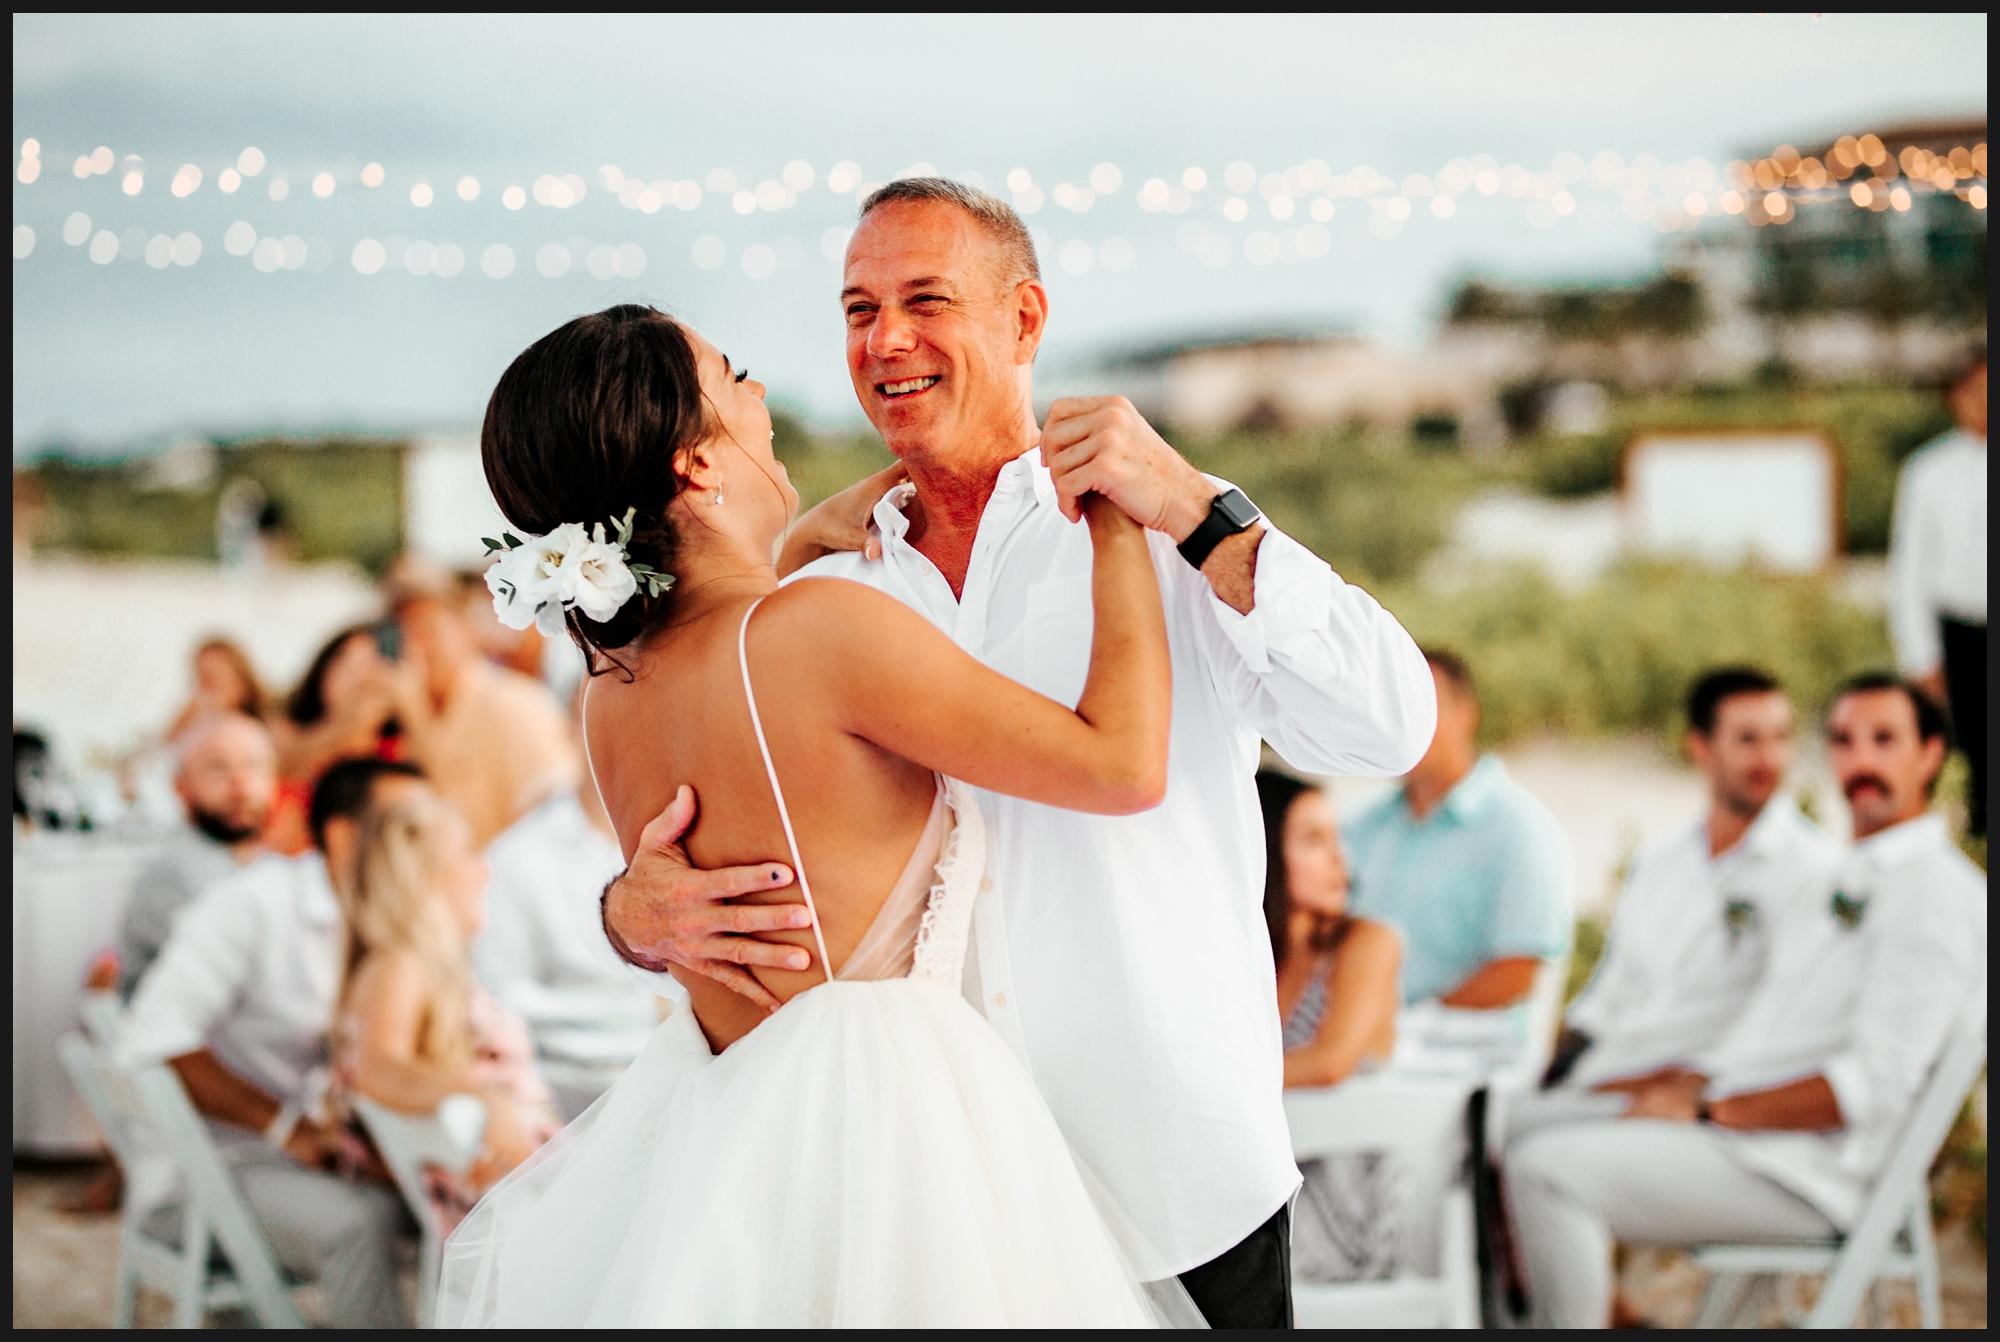 Orlando-Wedding-Photographer-destination-wedding-photographer-florida-wedding-photographer-bohemian-wedding-photographer_0544.jpg